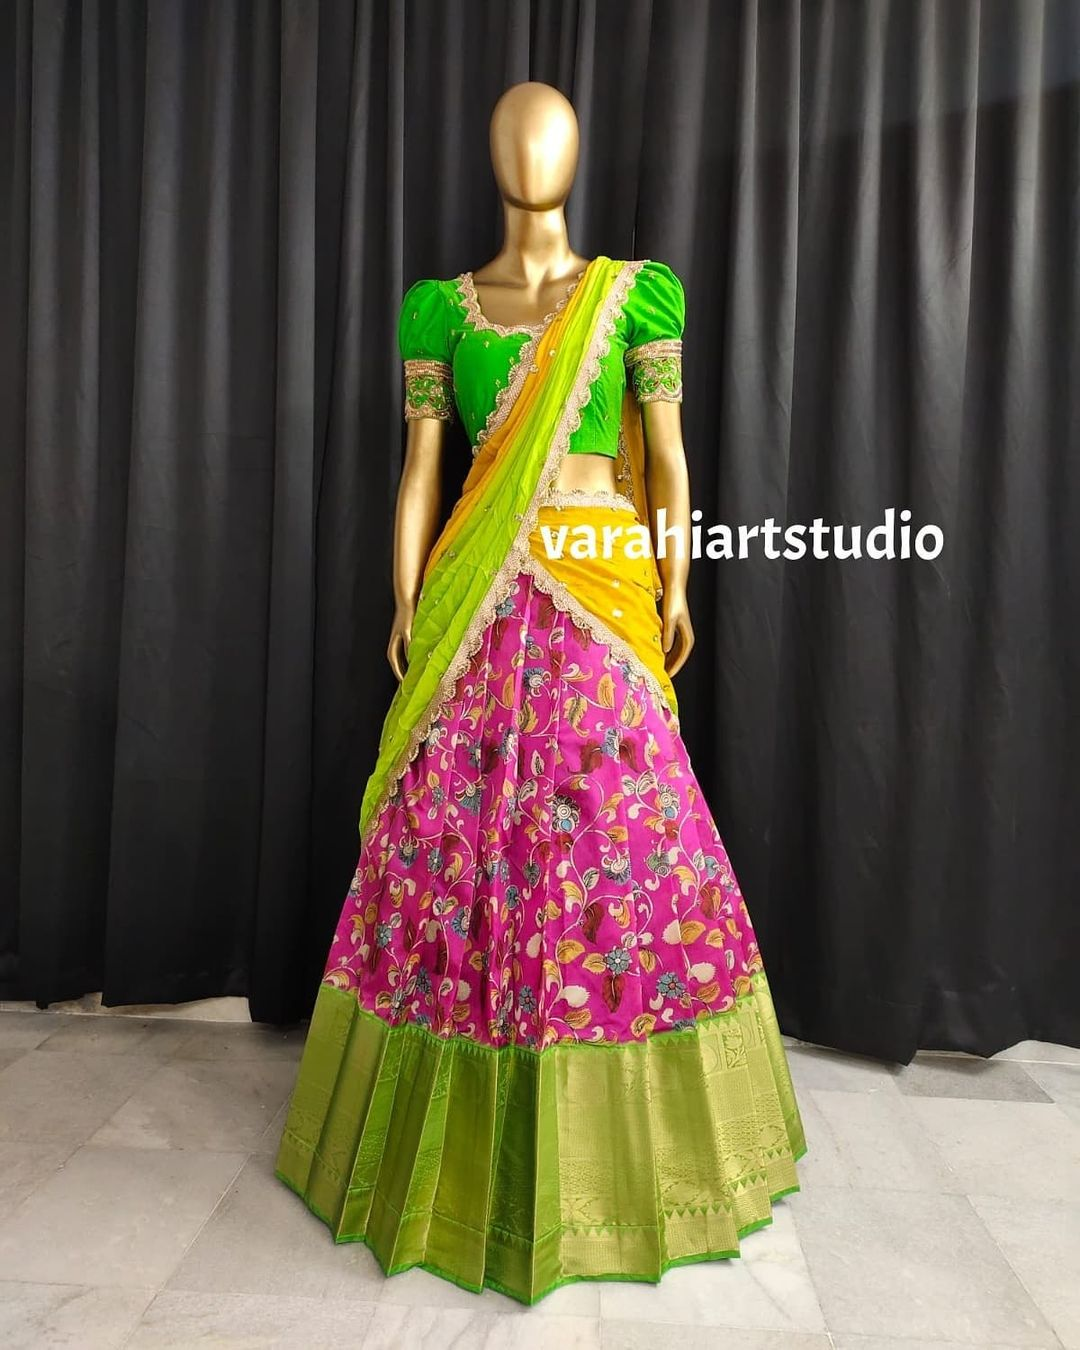 Stunning pink kalamkari kanchi pattu border lehenga and parrot green blouse with net dupatta. Blouse with maggam work. 2021-09-05